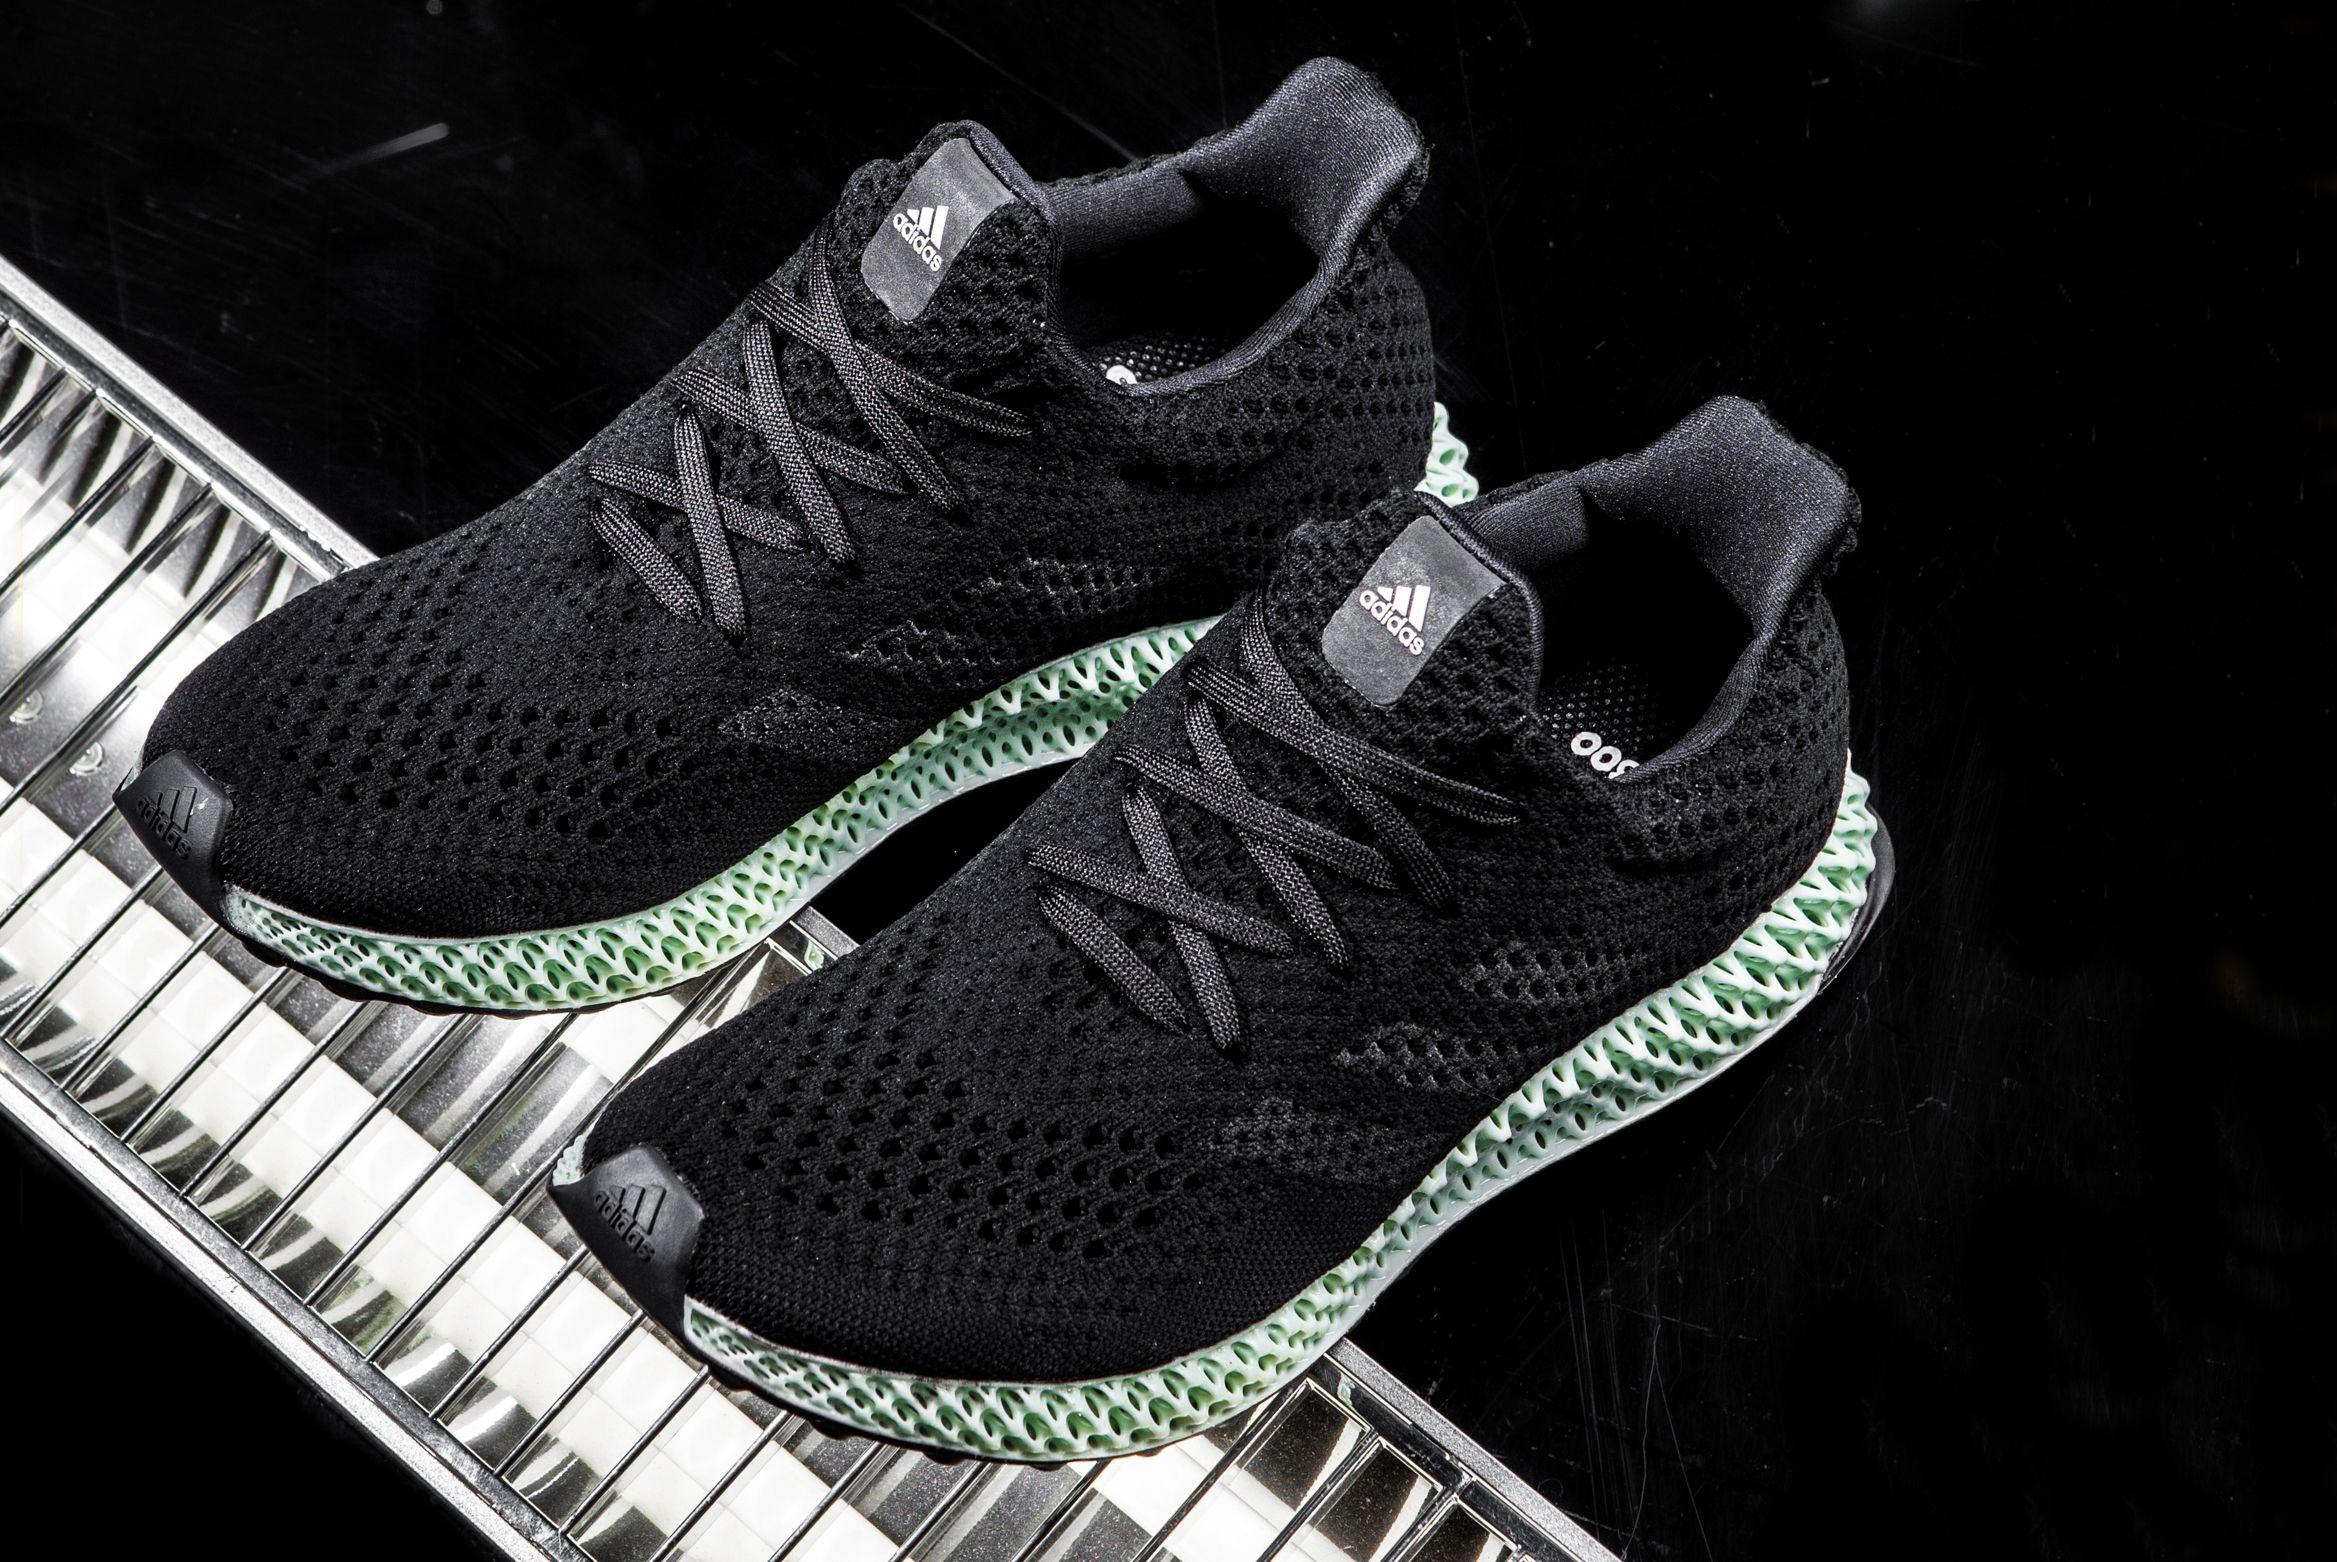 Adidas Futurecraft4 D